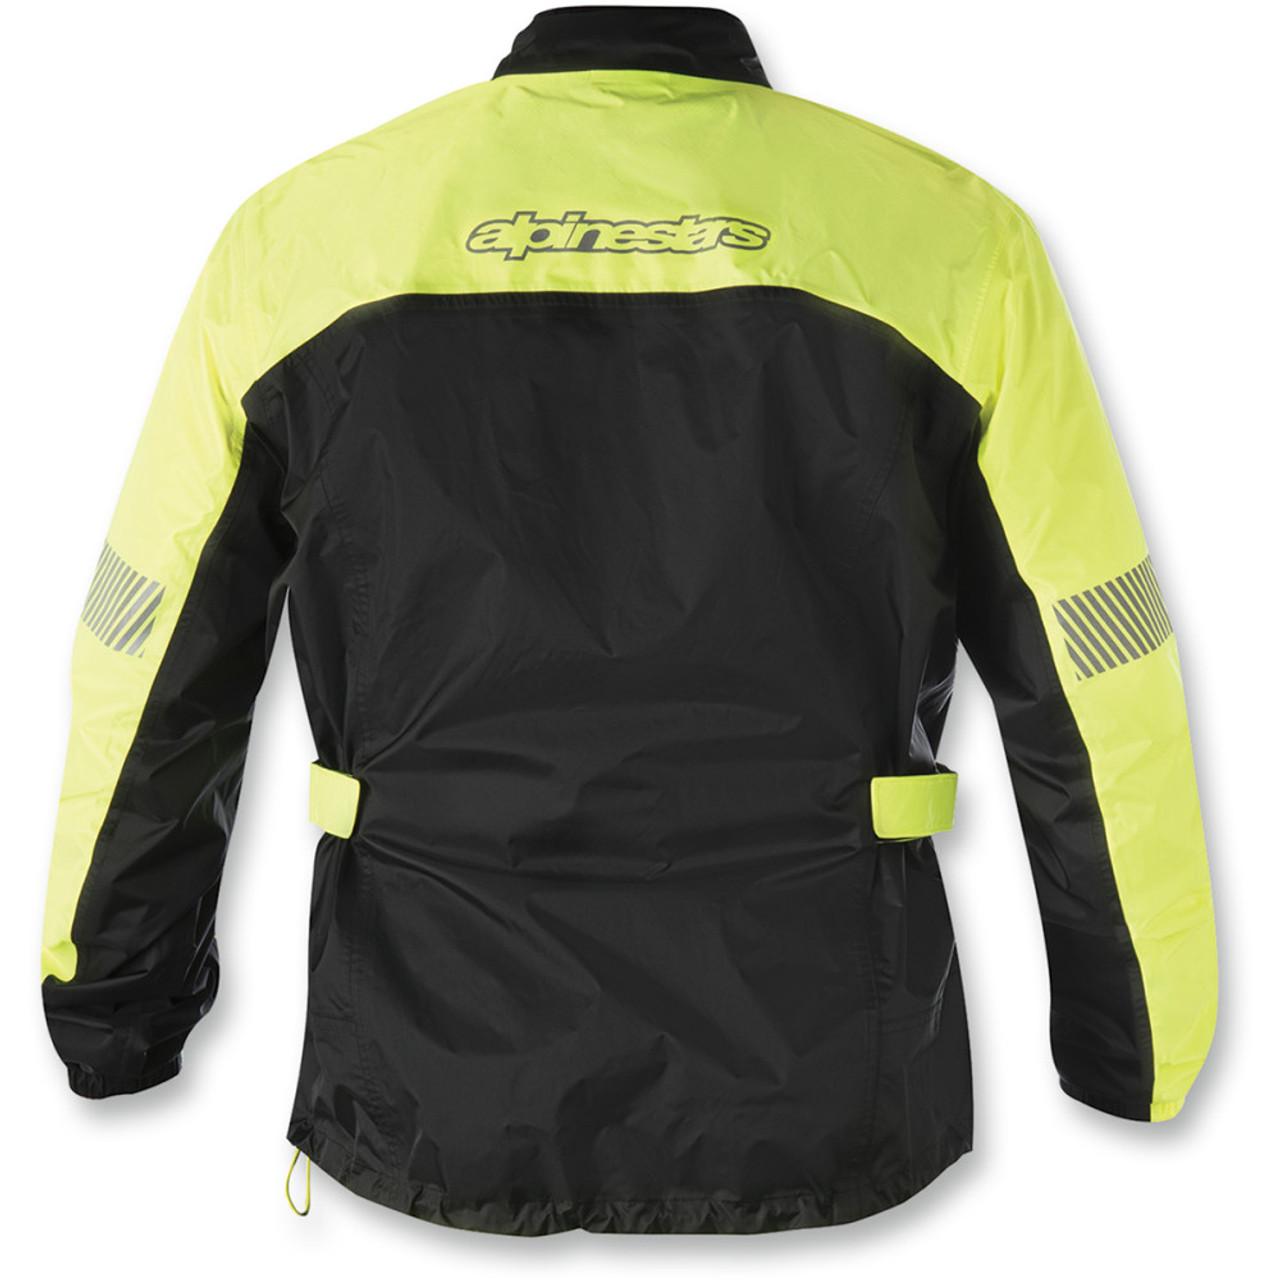 7fa79406b6a Alpinestars Hurricane Motorcycle Rain Jacket - Black/Yellow - Get ...